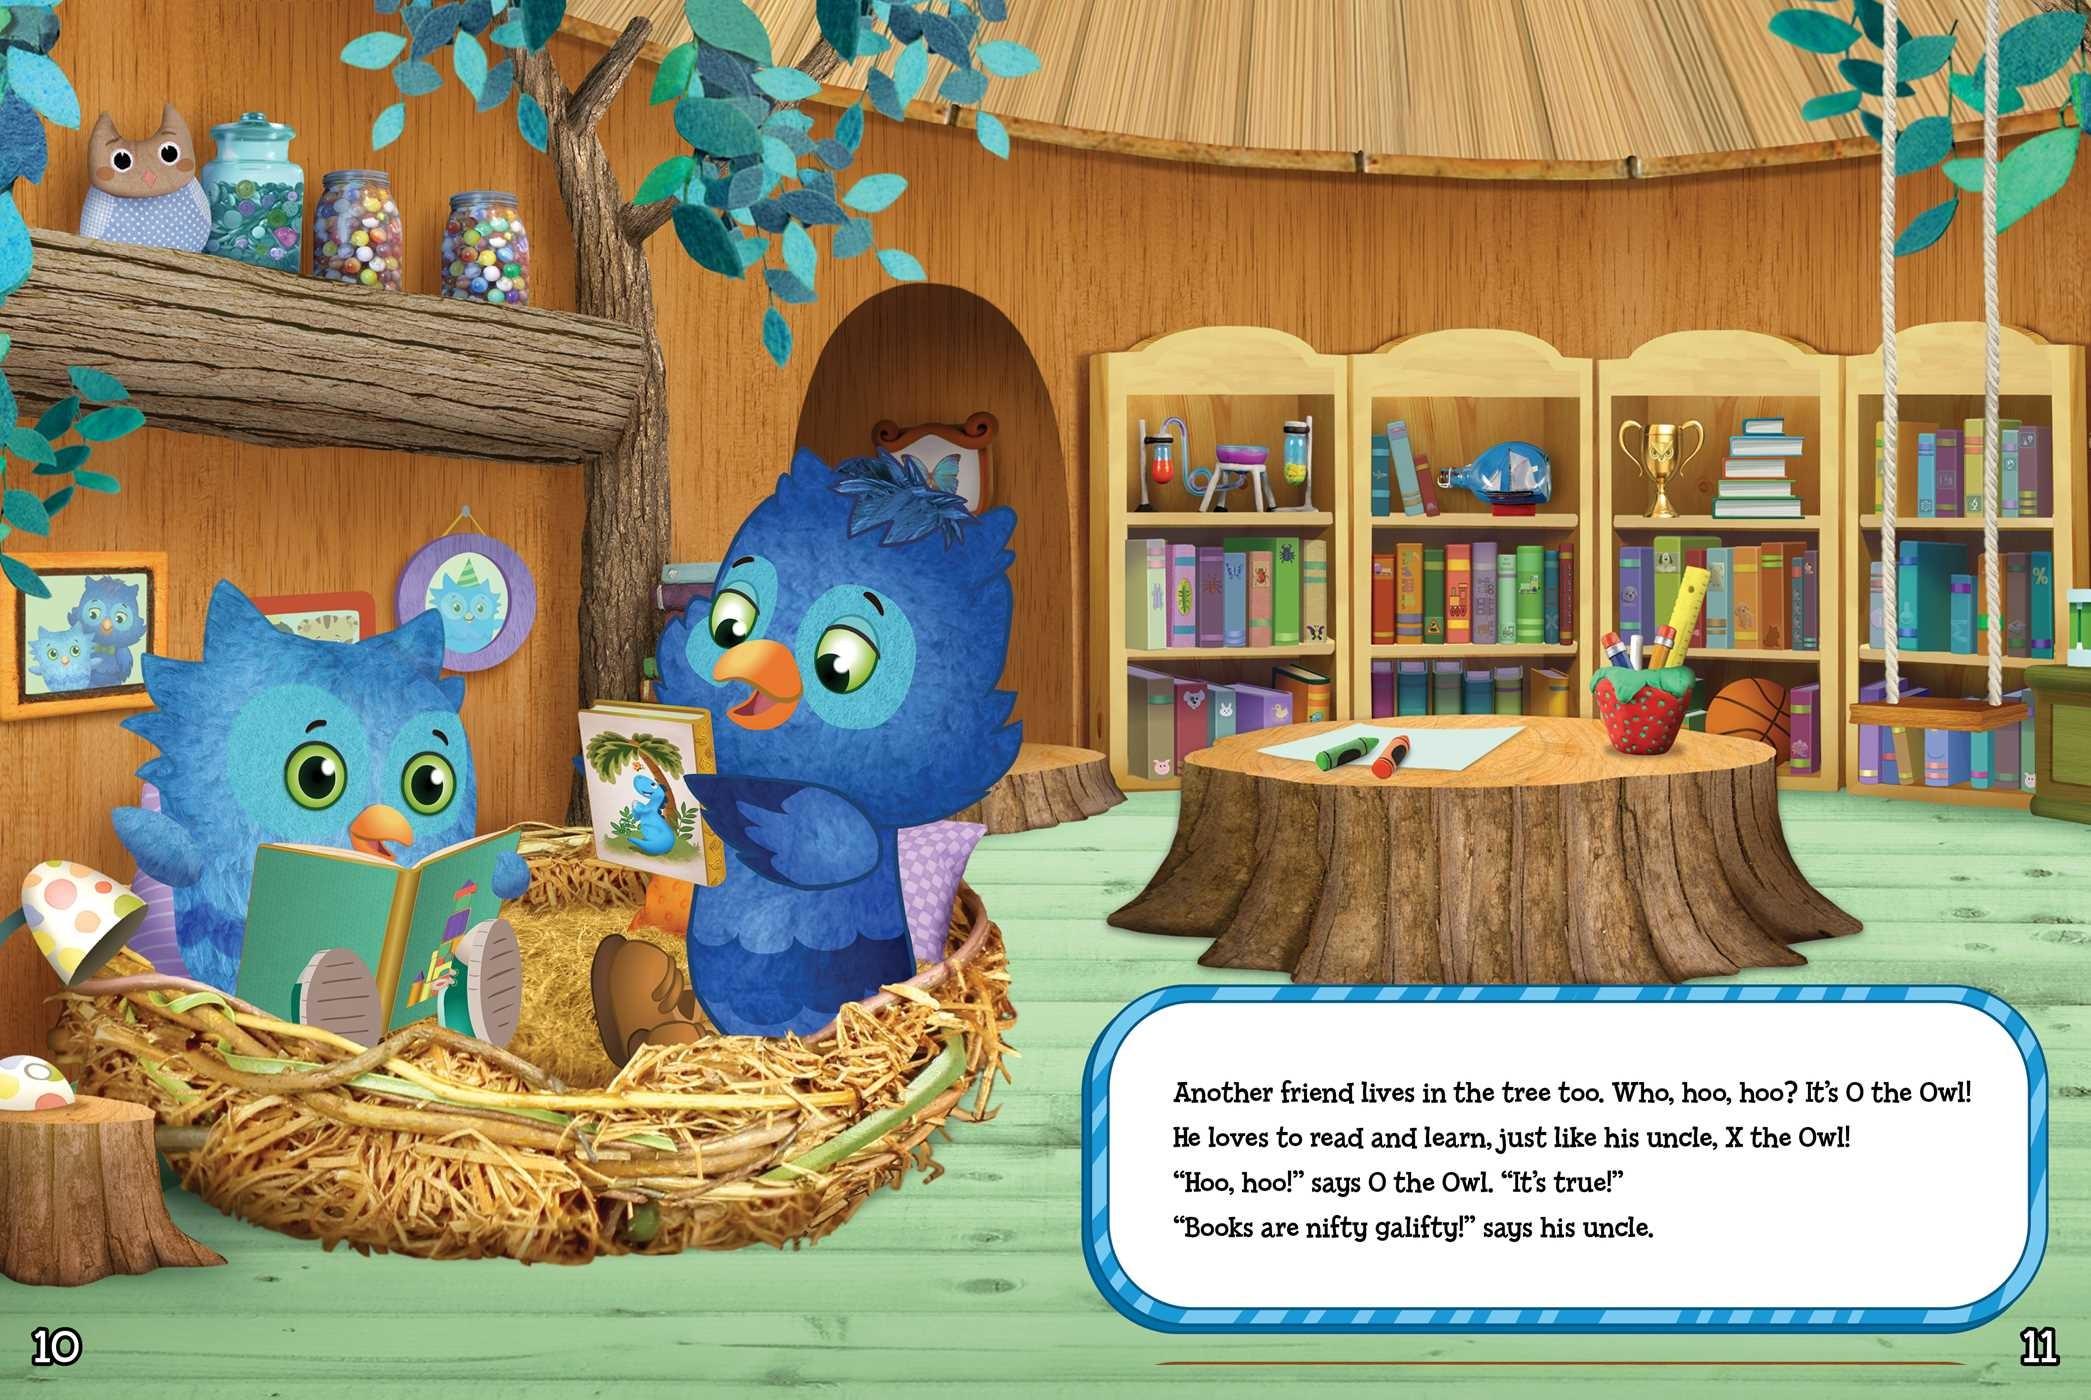 Daniel tigers 3 minute bedtime stories 9781534428591.in03